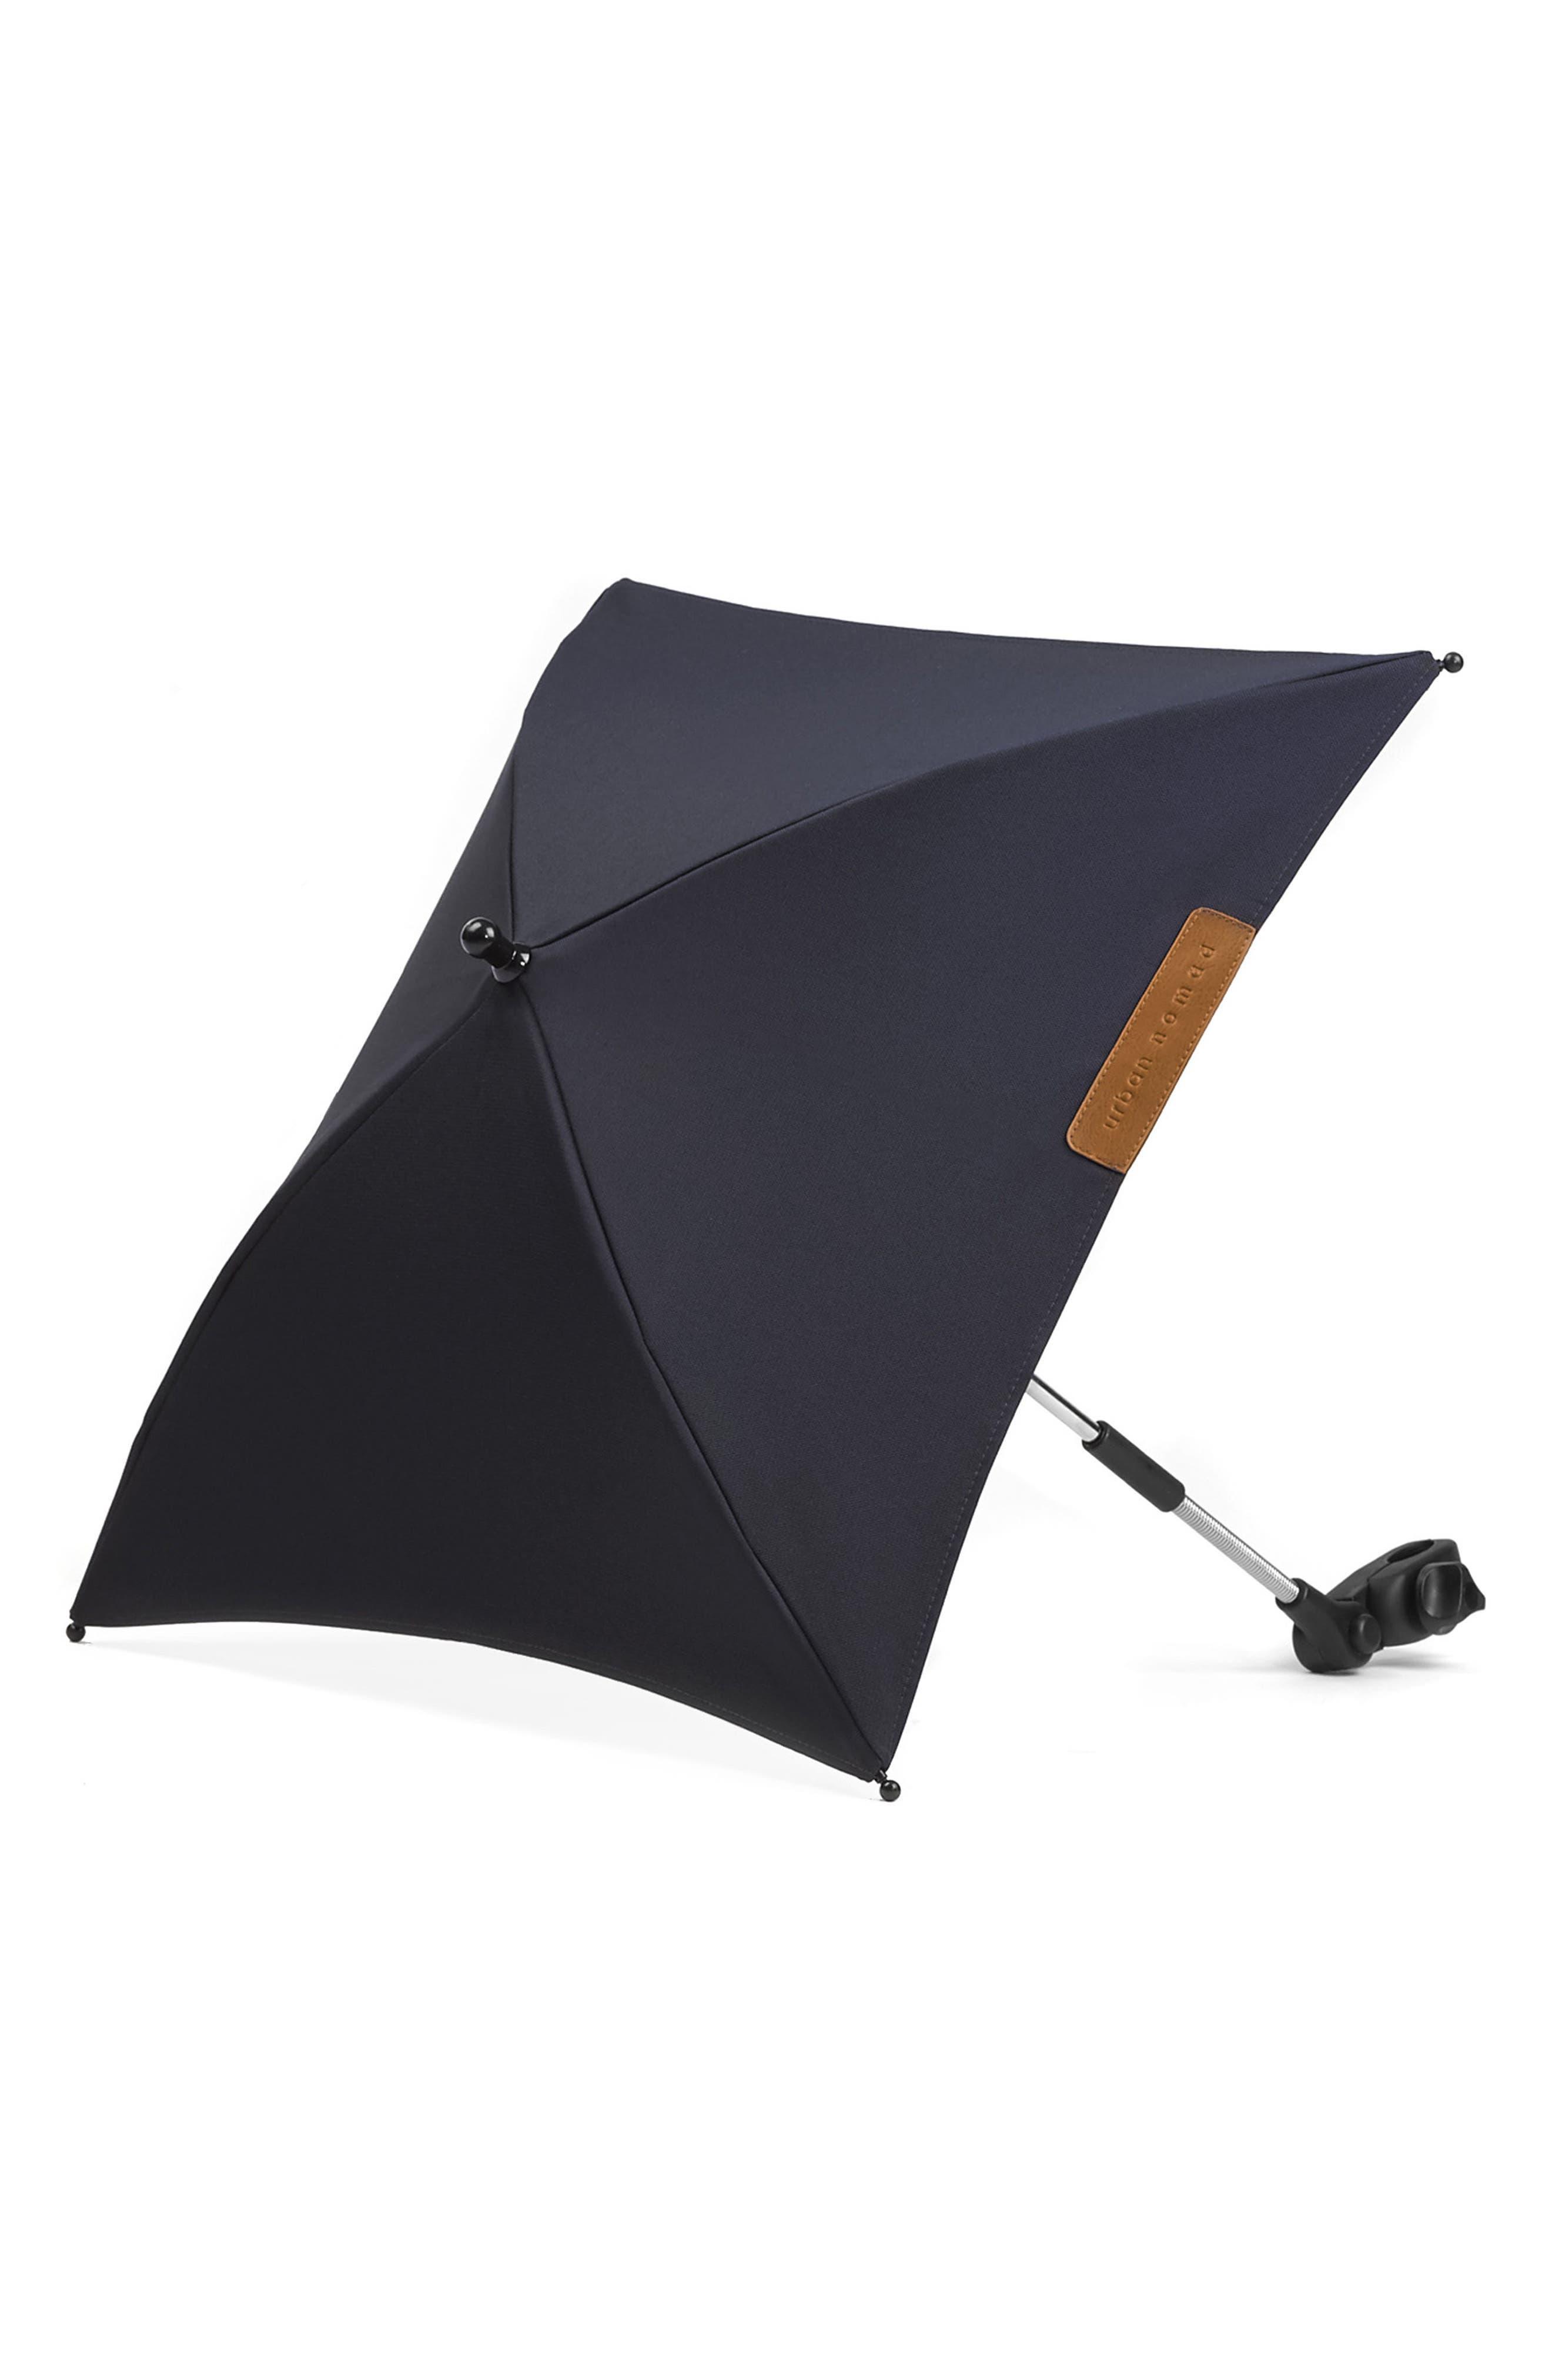 Evo - Urban Nomad Stroller Umbrella,                         Main,                         color, Blue